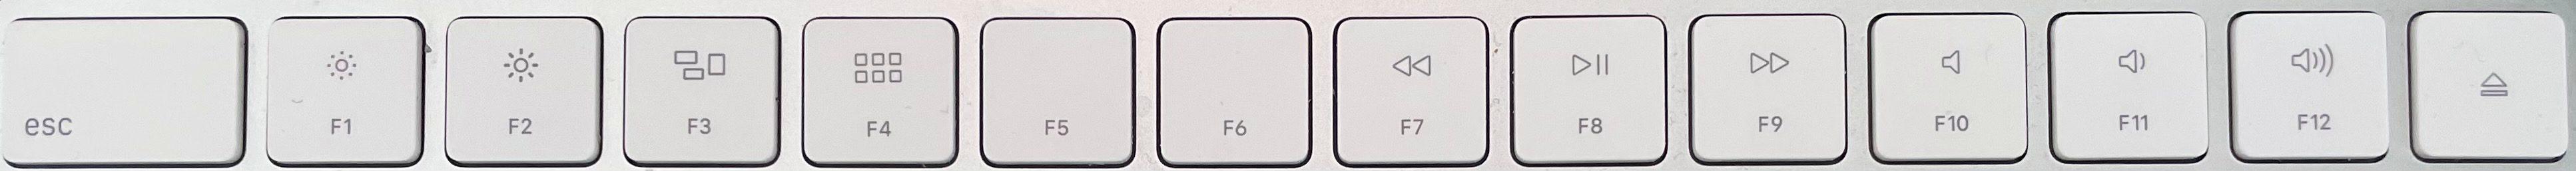 New Mac Magic Keyboard: What we'd like to see - old function keys